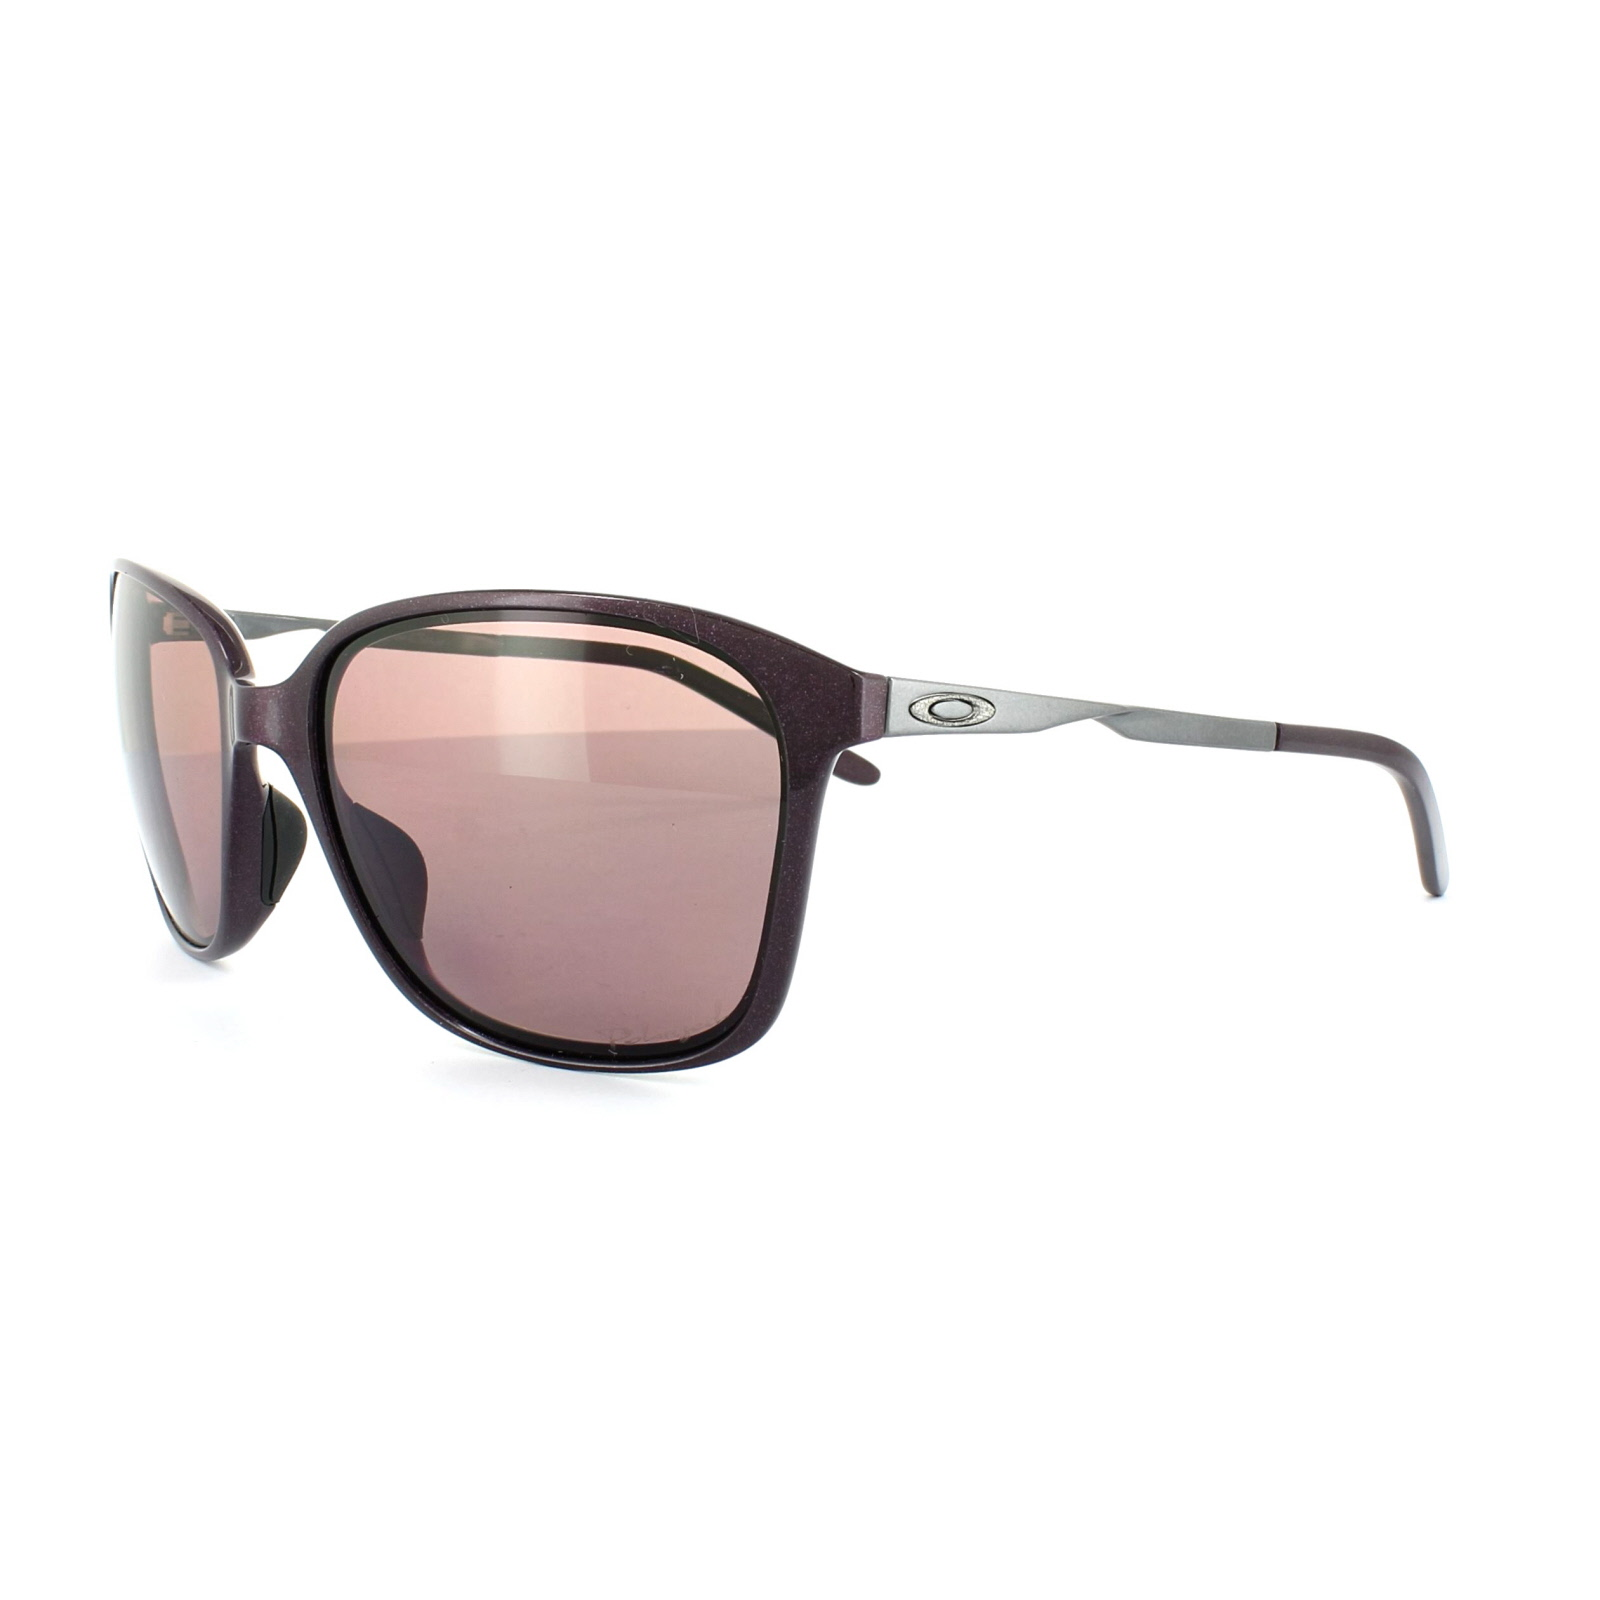 Frame Changers Eyeglasses : Oakley Sunglasses Game Changer OO9291-06 Raspberry ...